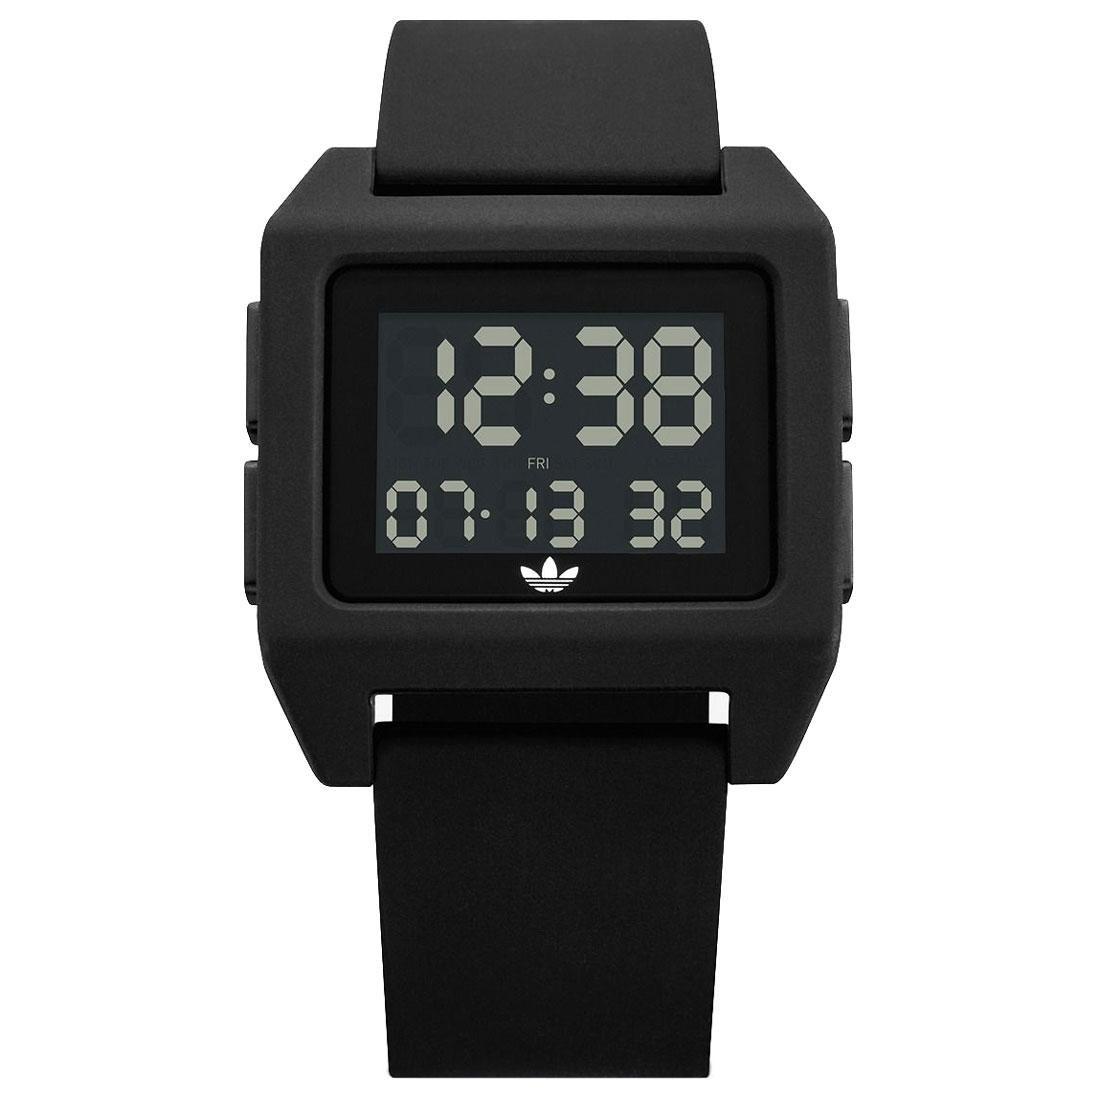 Adidas Archive SP1 Watch (black / all black)